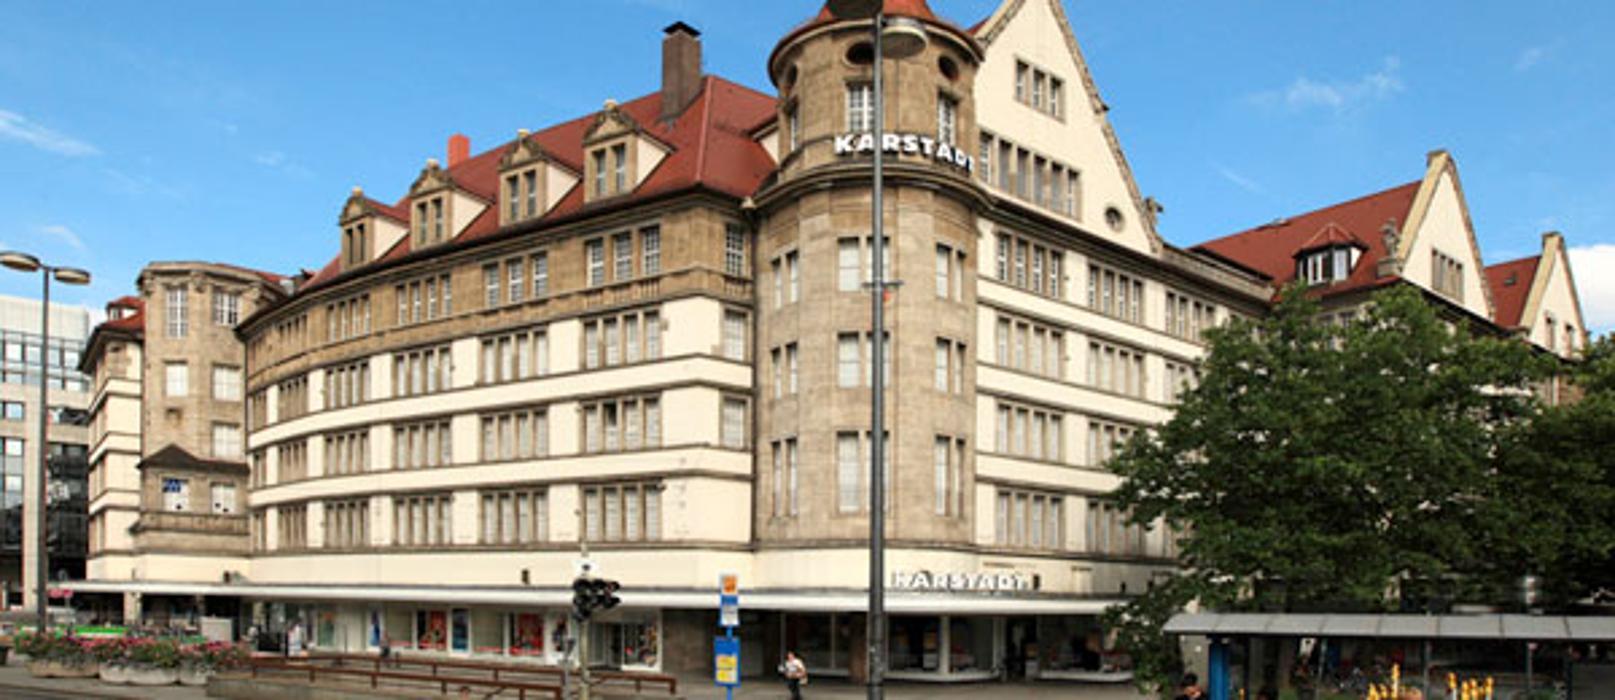 Karstadt München Bahnhofplatz, Bahnhofplatz in München